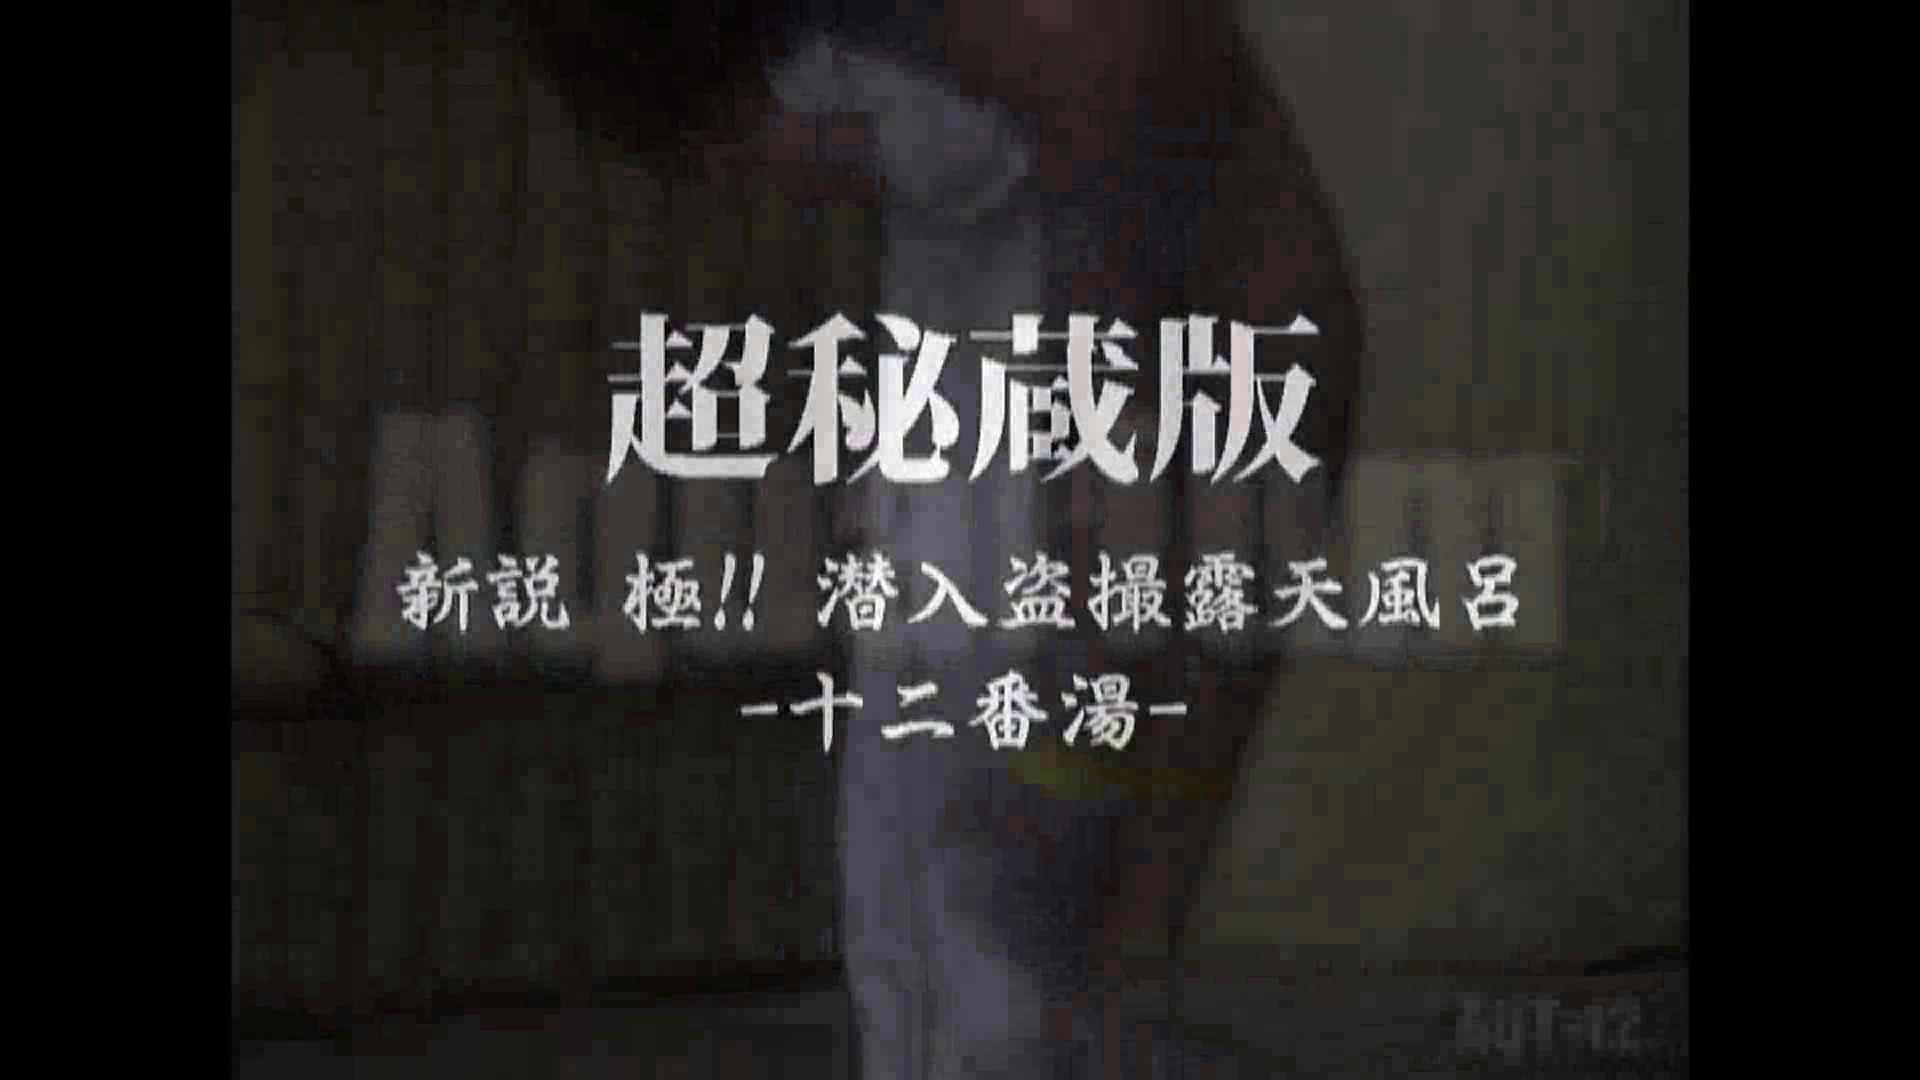 Aquaな露天風呂Vol.876潜入盗撮露天風呂十二判湯 其の五 盗撮 性交動画流出 112連発 2